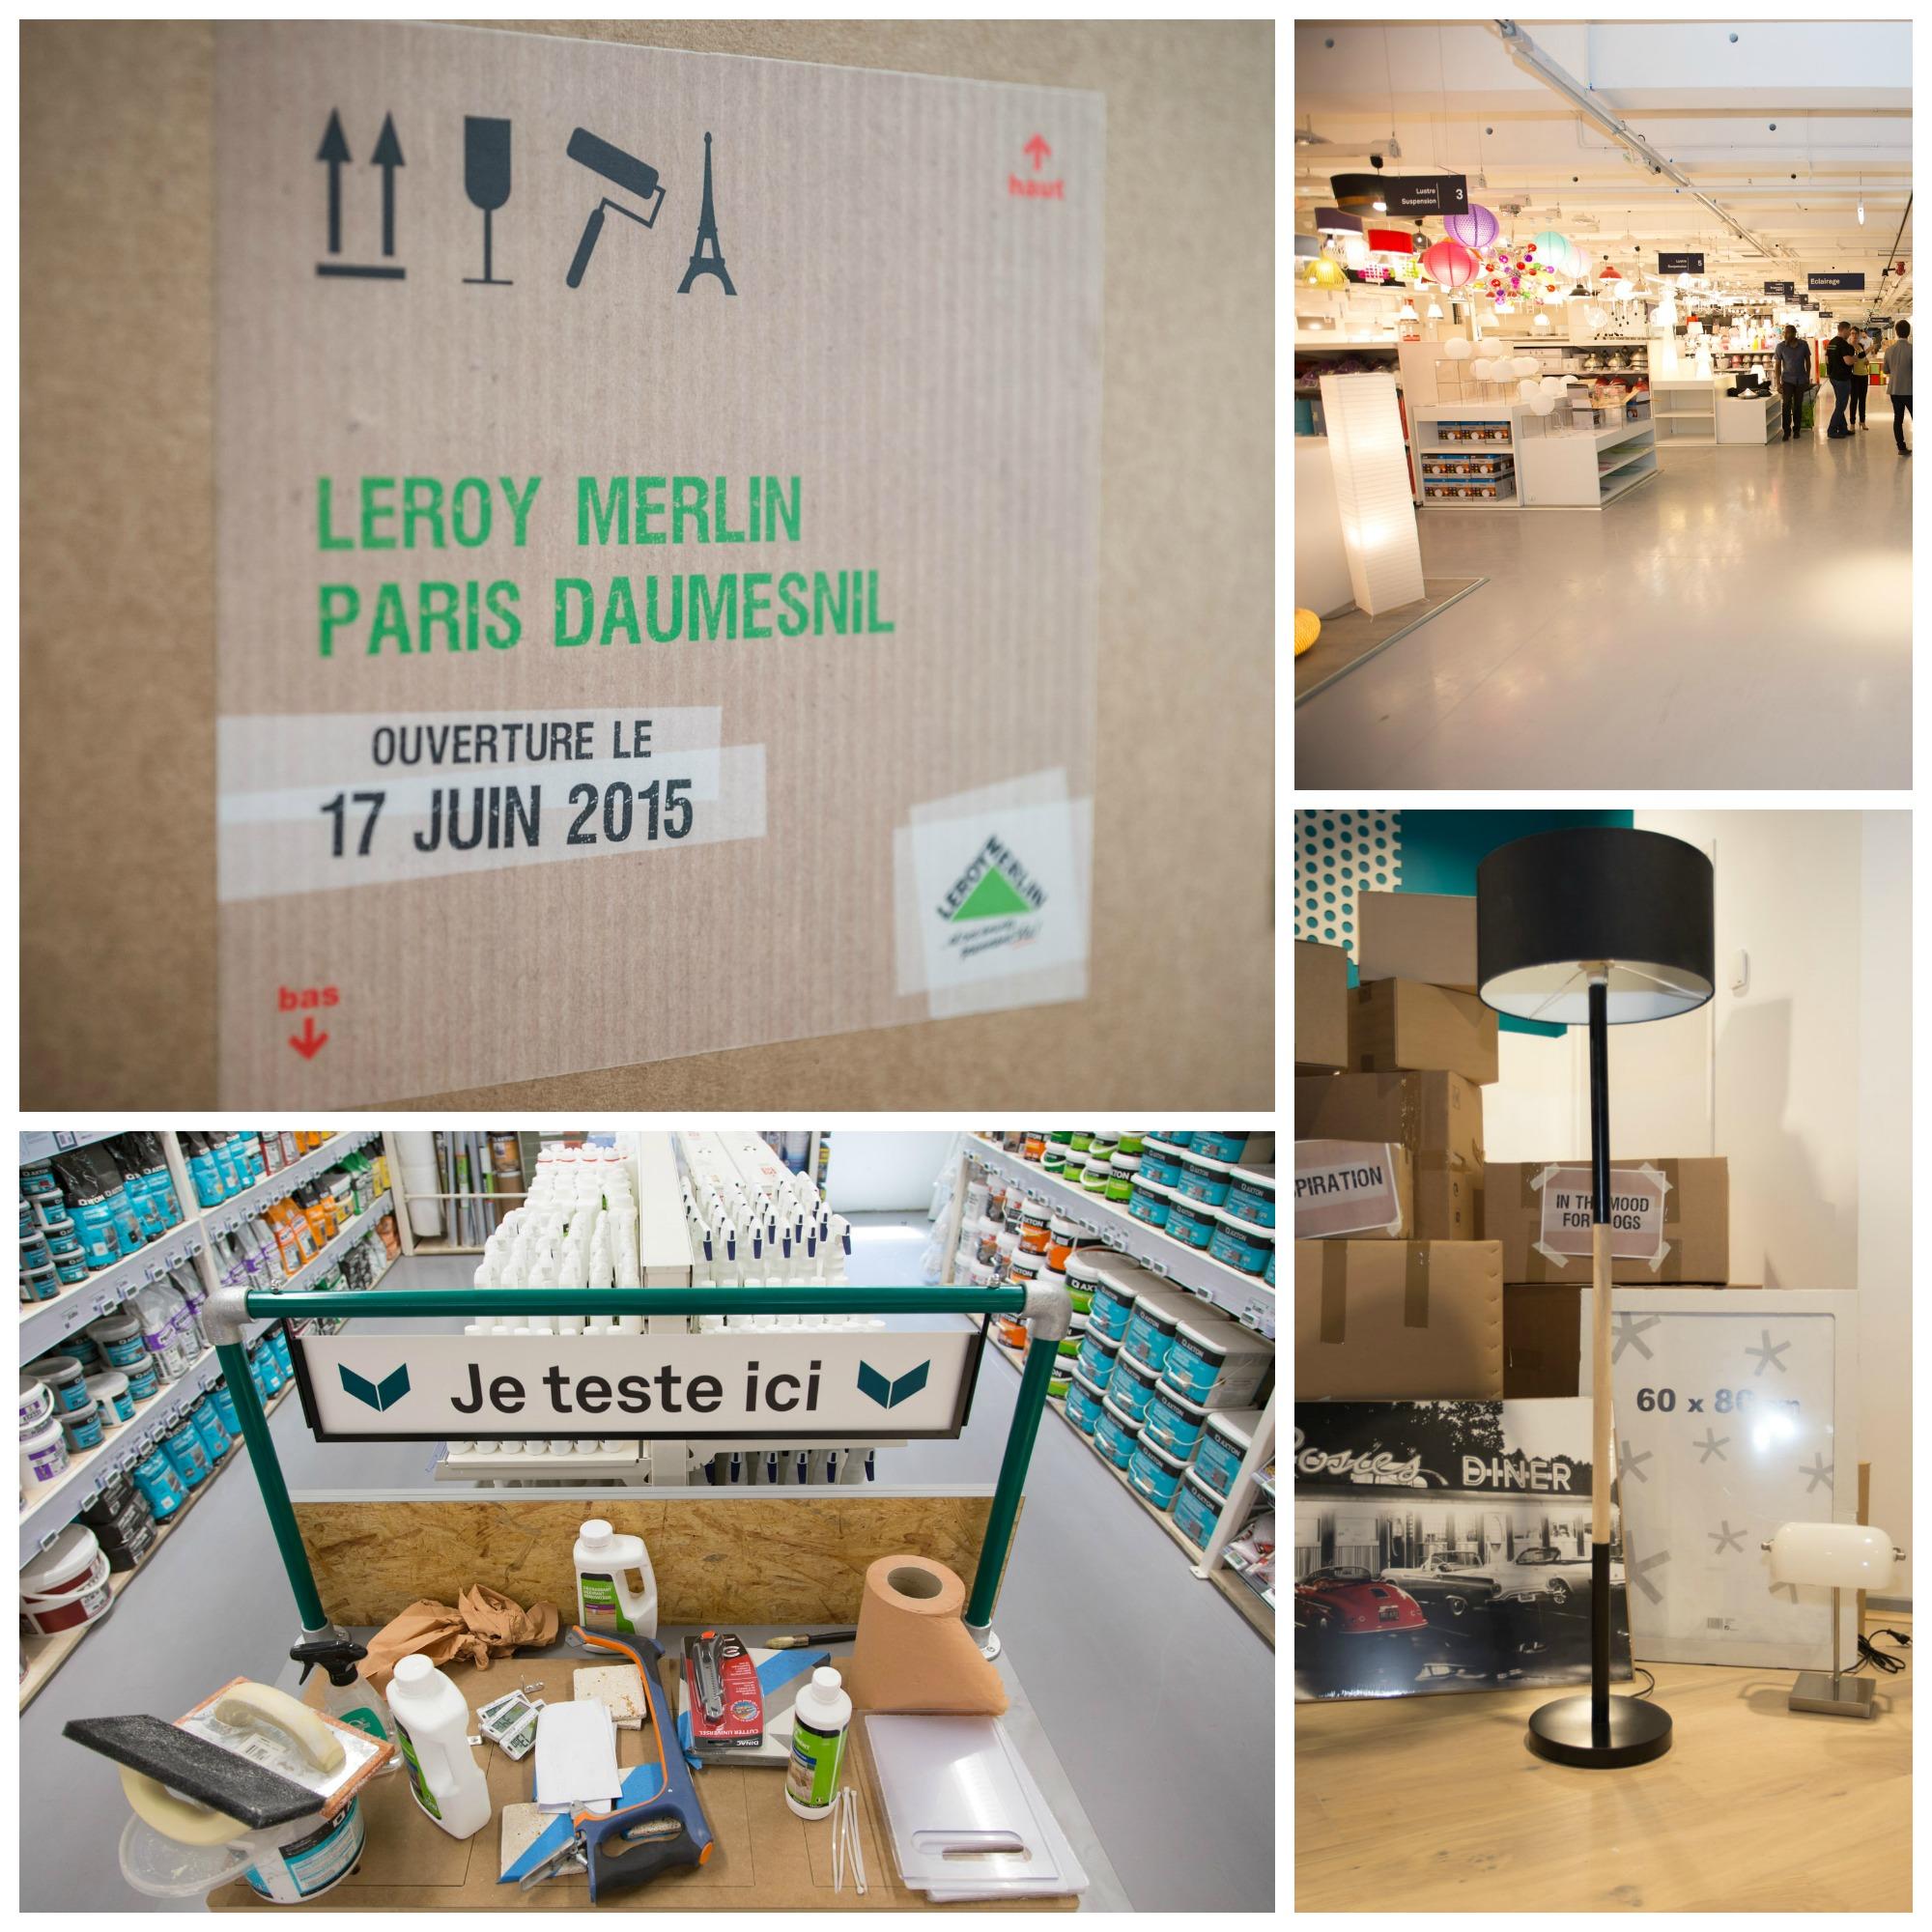 Leroy merlin paris 12 strasbourg design - Magasin leroy merlin paris ...